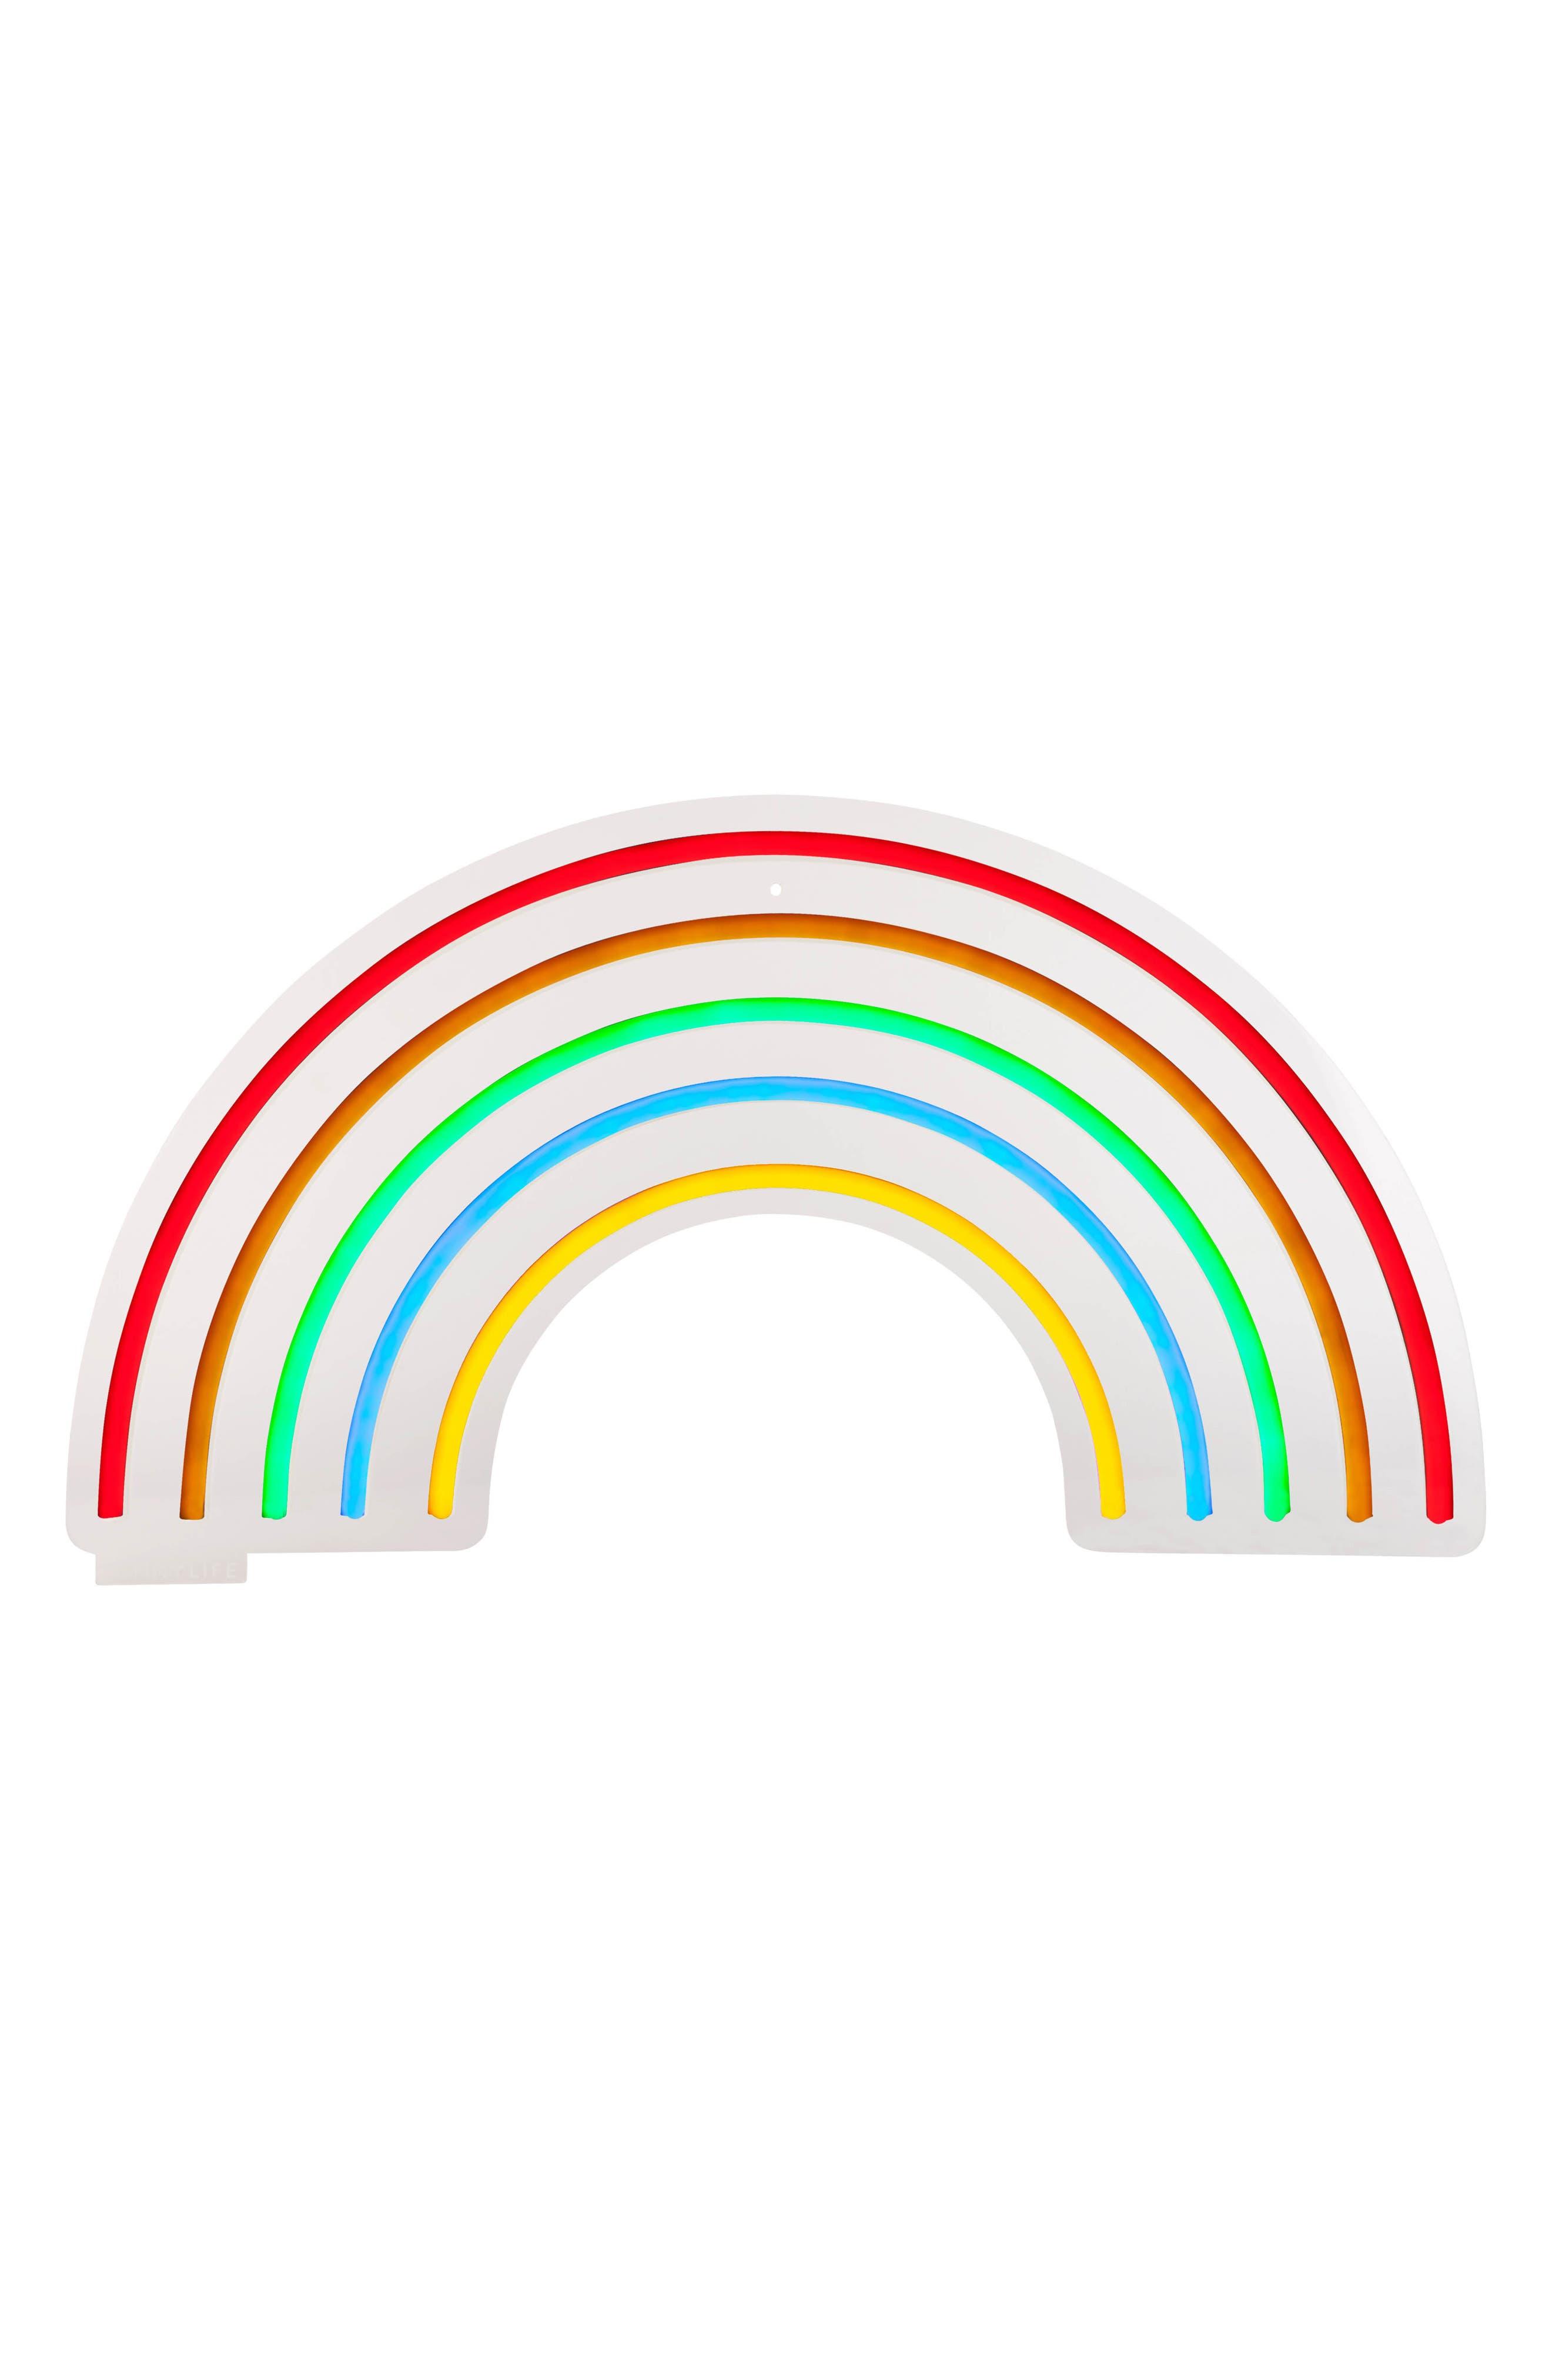 Main Image - Sunnylife Rainbow Neon LED Wall Light (Girls)